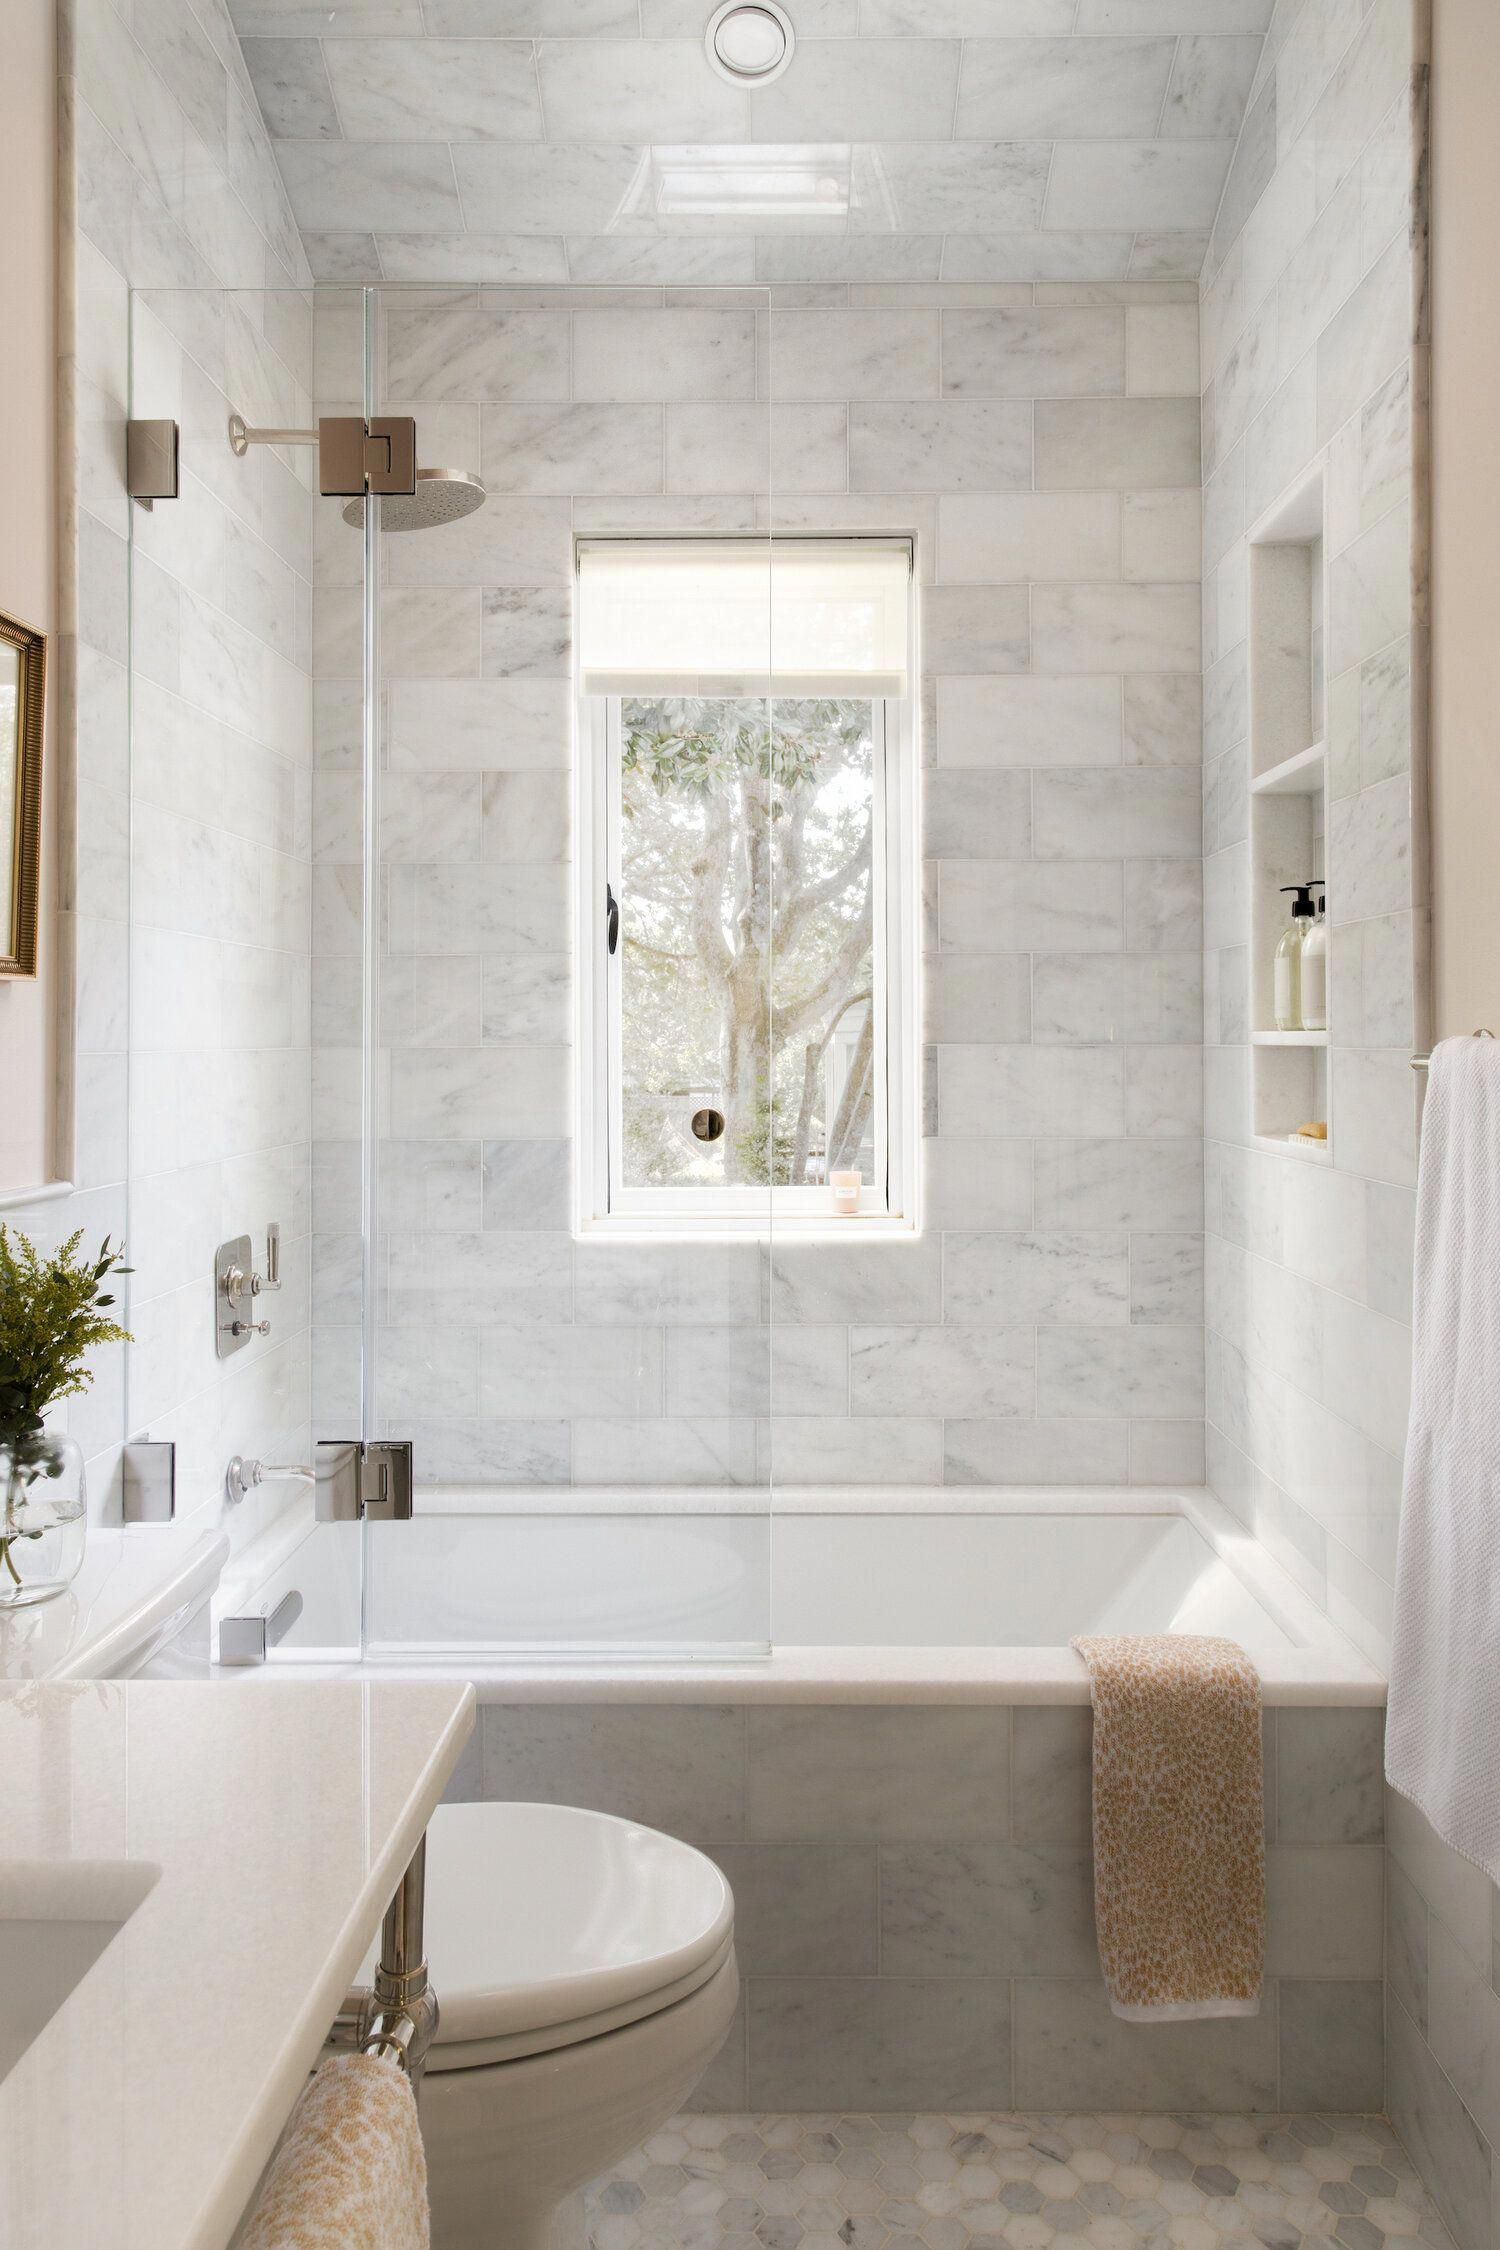 Shabby Chic Home Decor For Sale Renovation In 2020 Small Bathroom Remodel Bathroom Design Bathroom Inspiration Modern